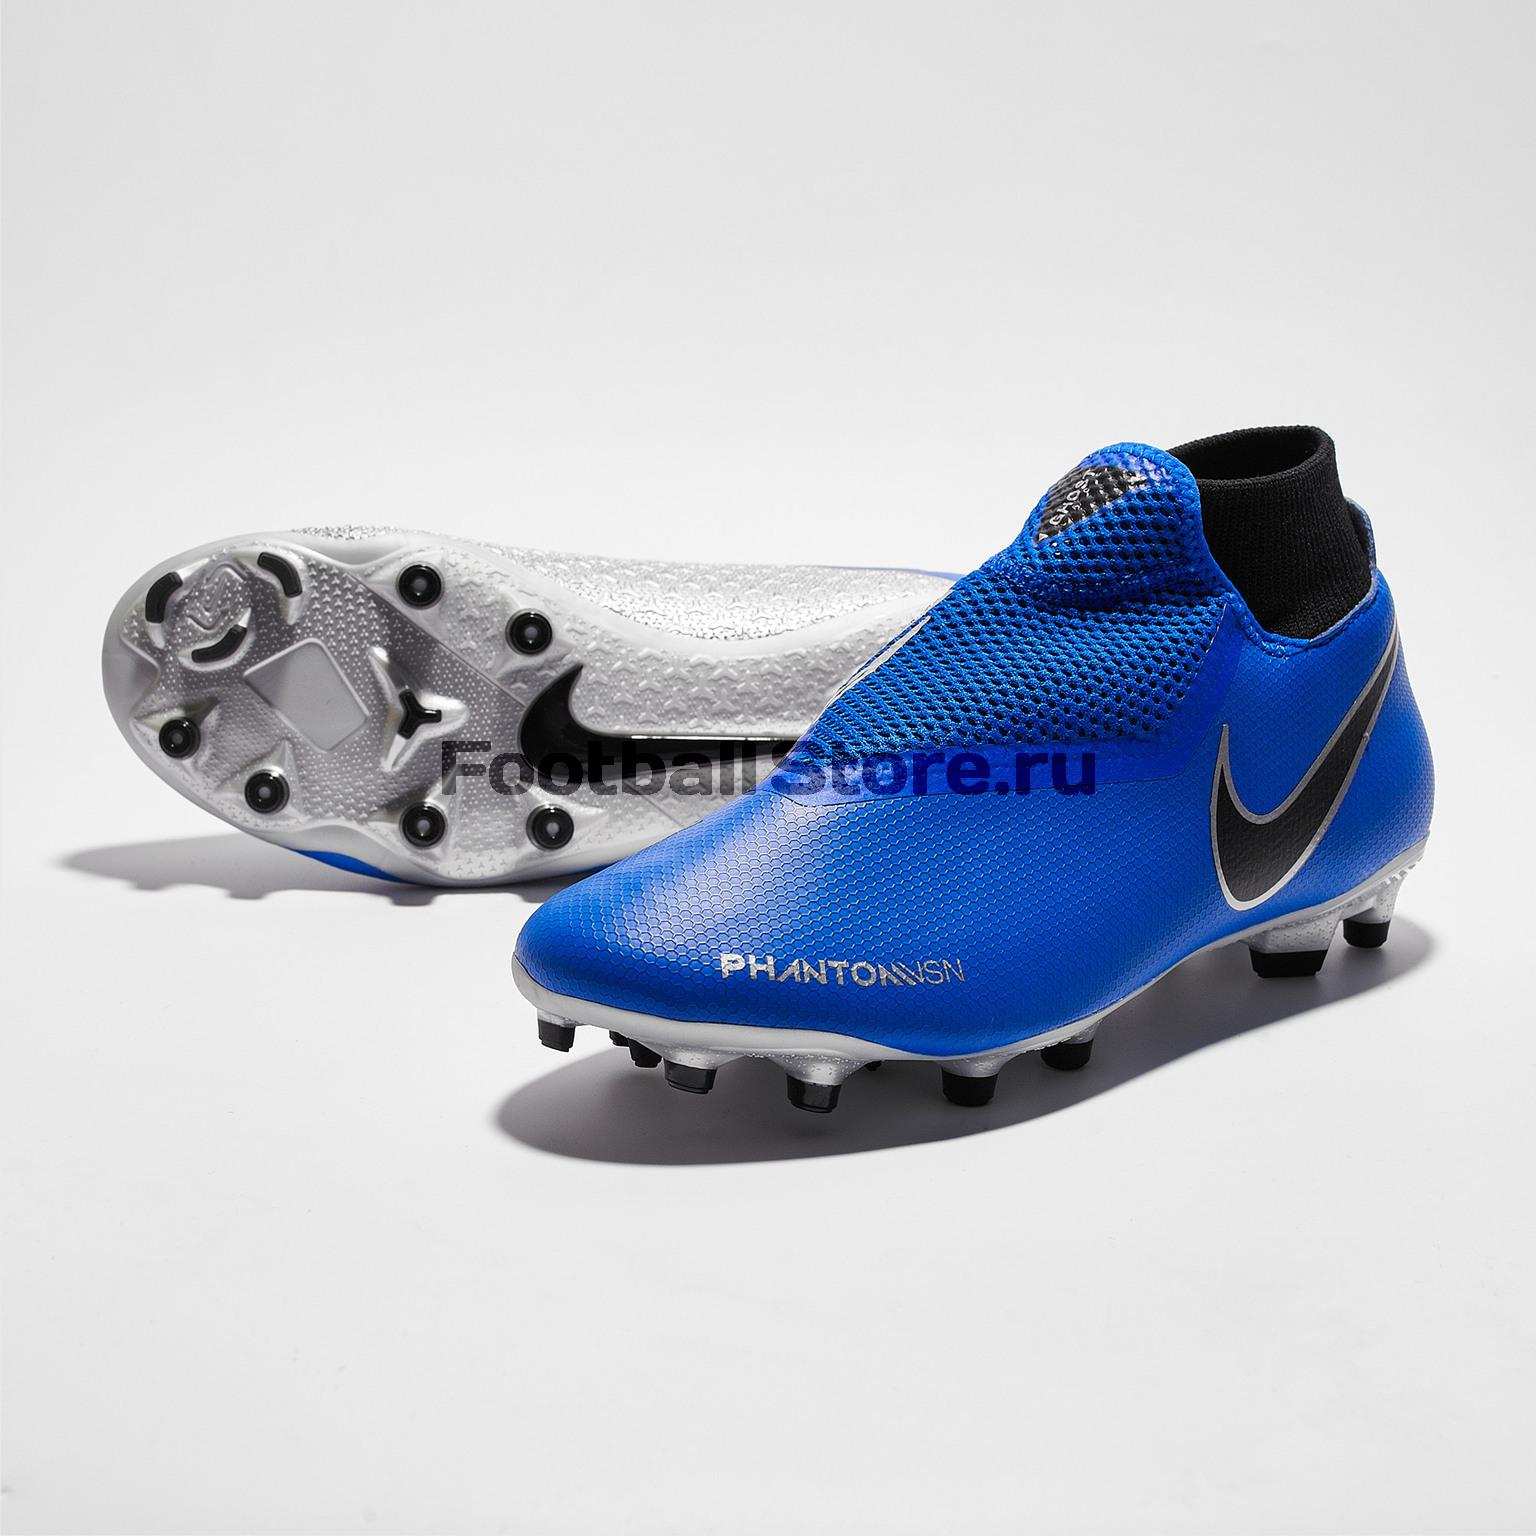 Бутсы Nike Phantom 3 Academy DF MG AO3258-400 бутсы nike phantom 3 academy df fg ah7268 081